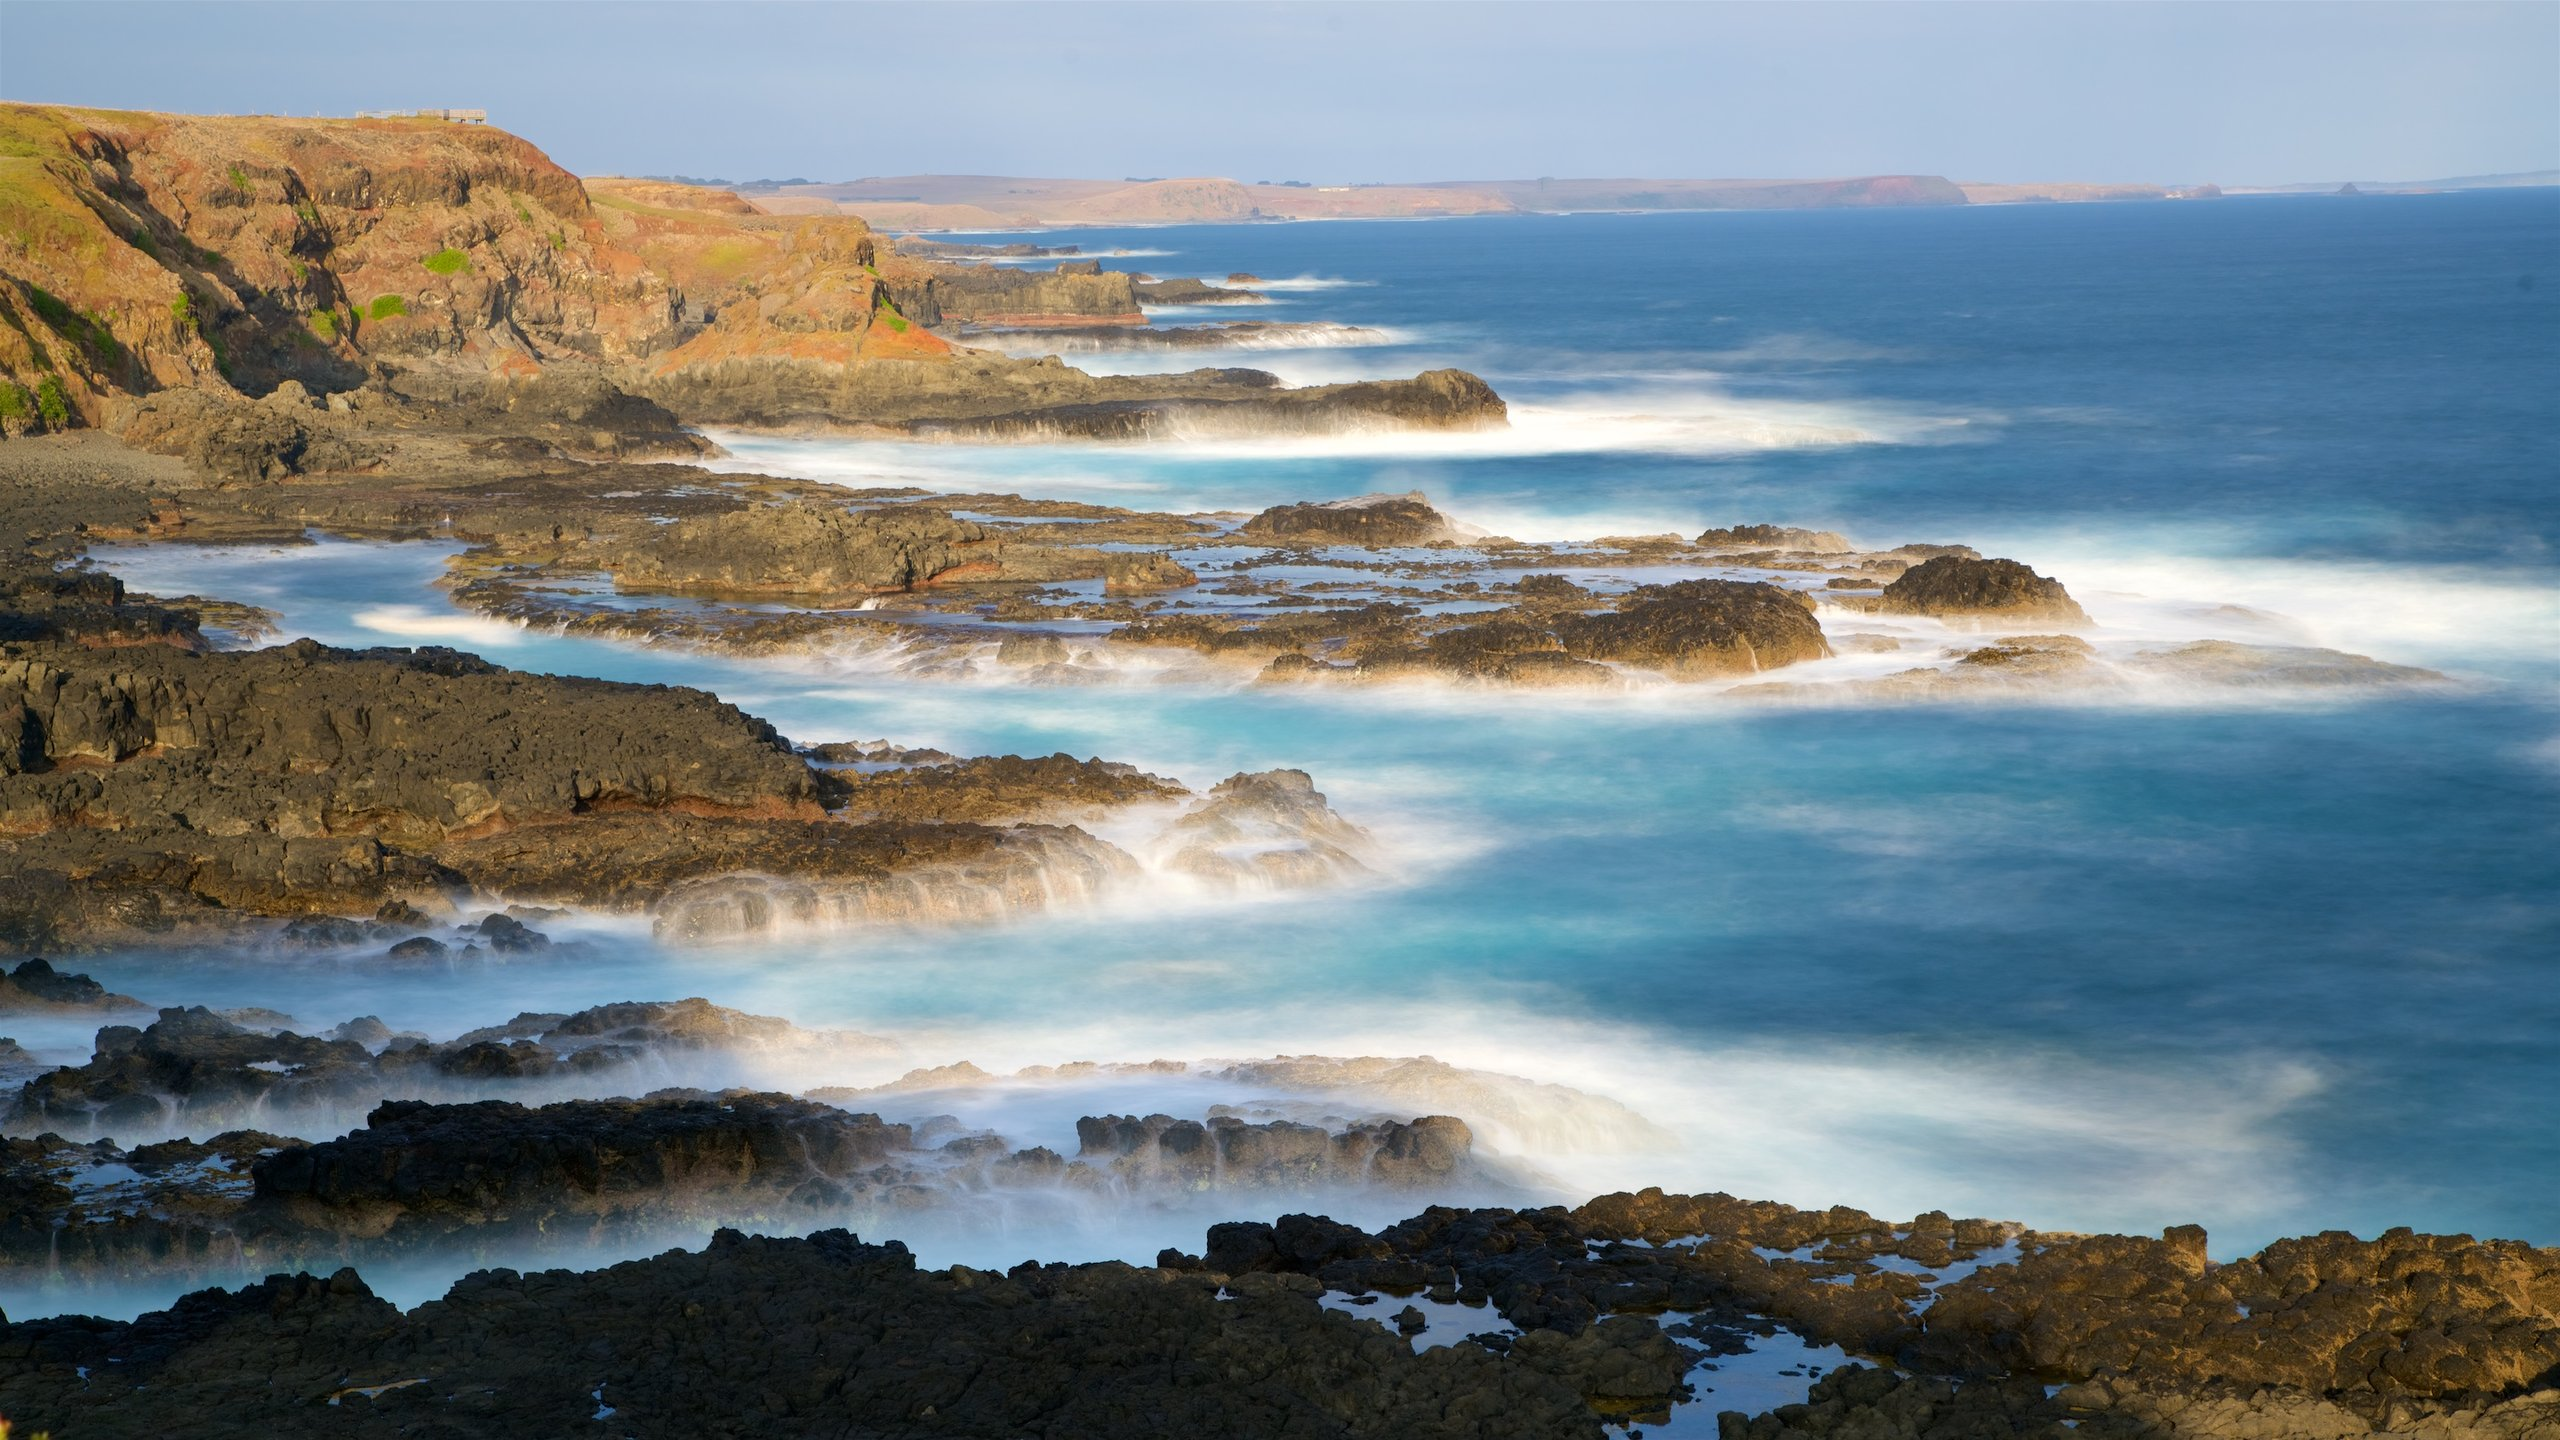 Phillip Island, Victoria, Australia